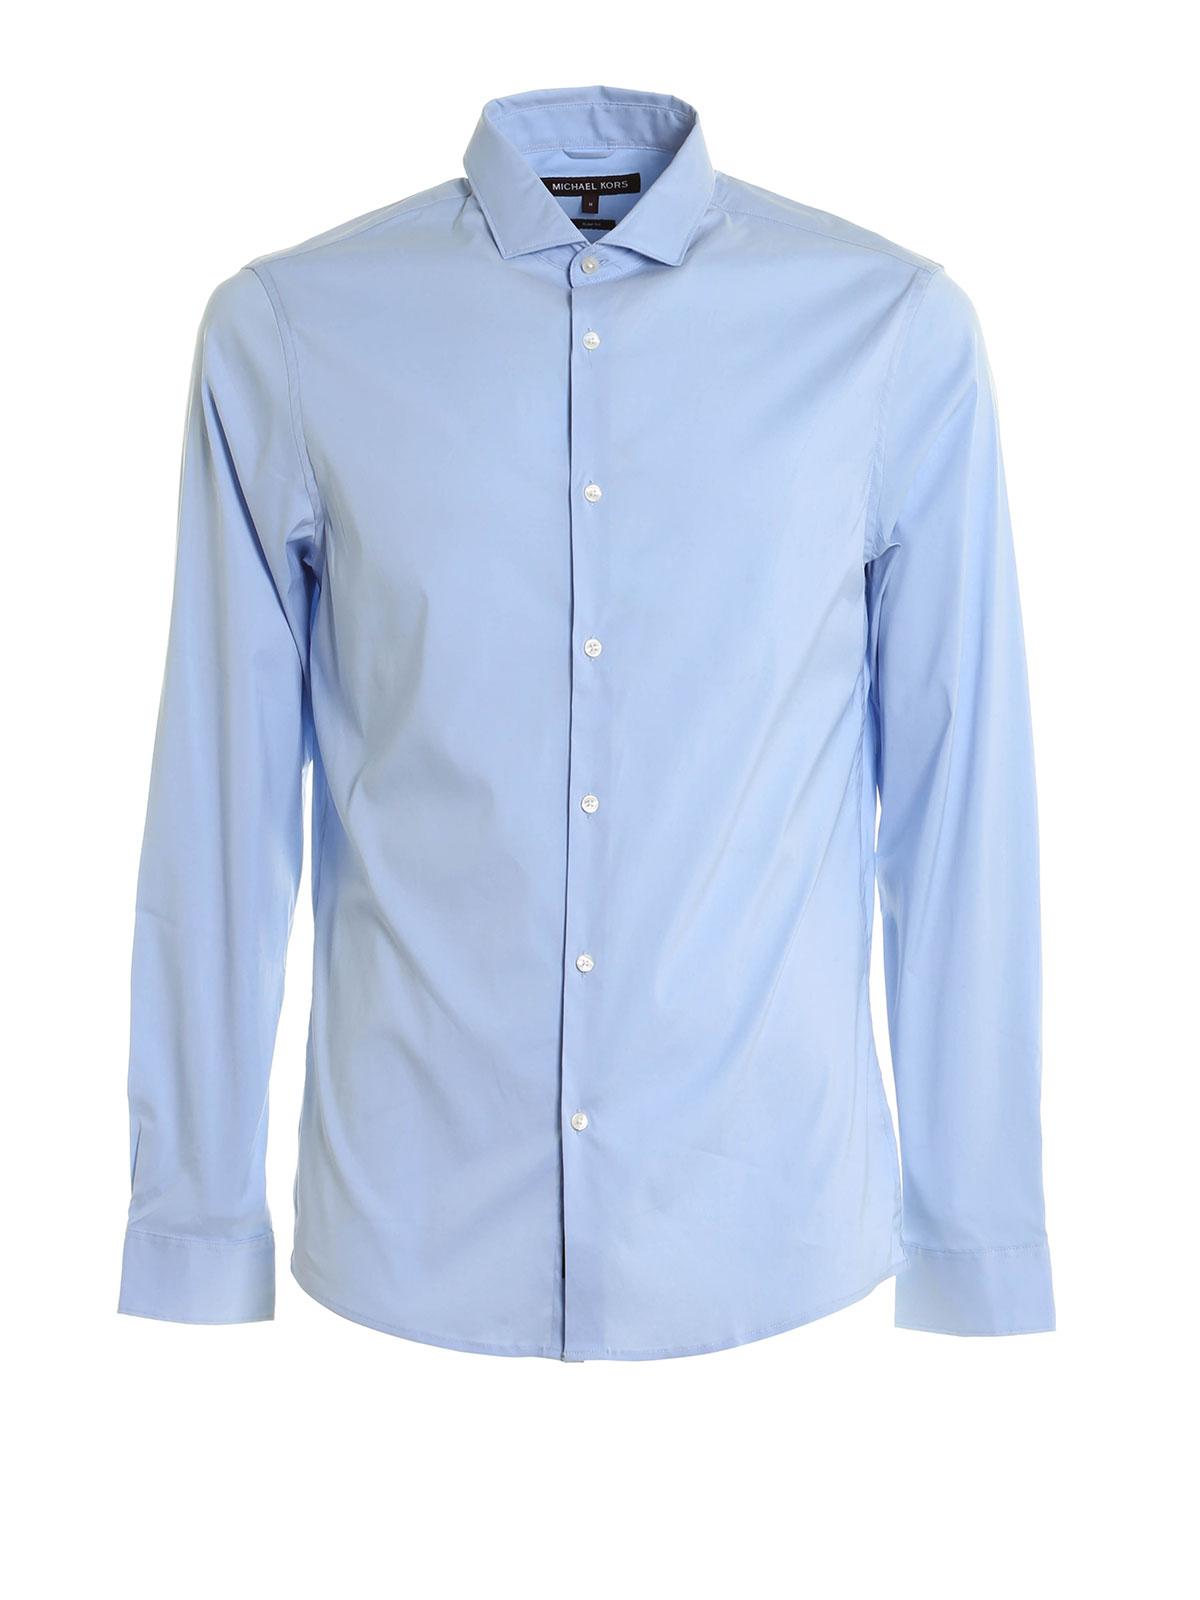 slim fit cotton blend shirt by michael kors shirts